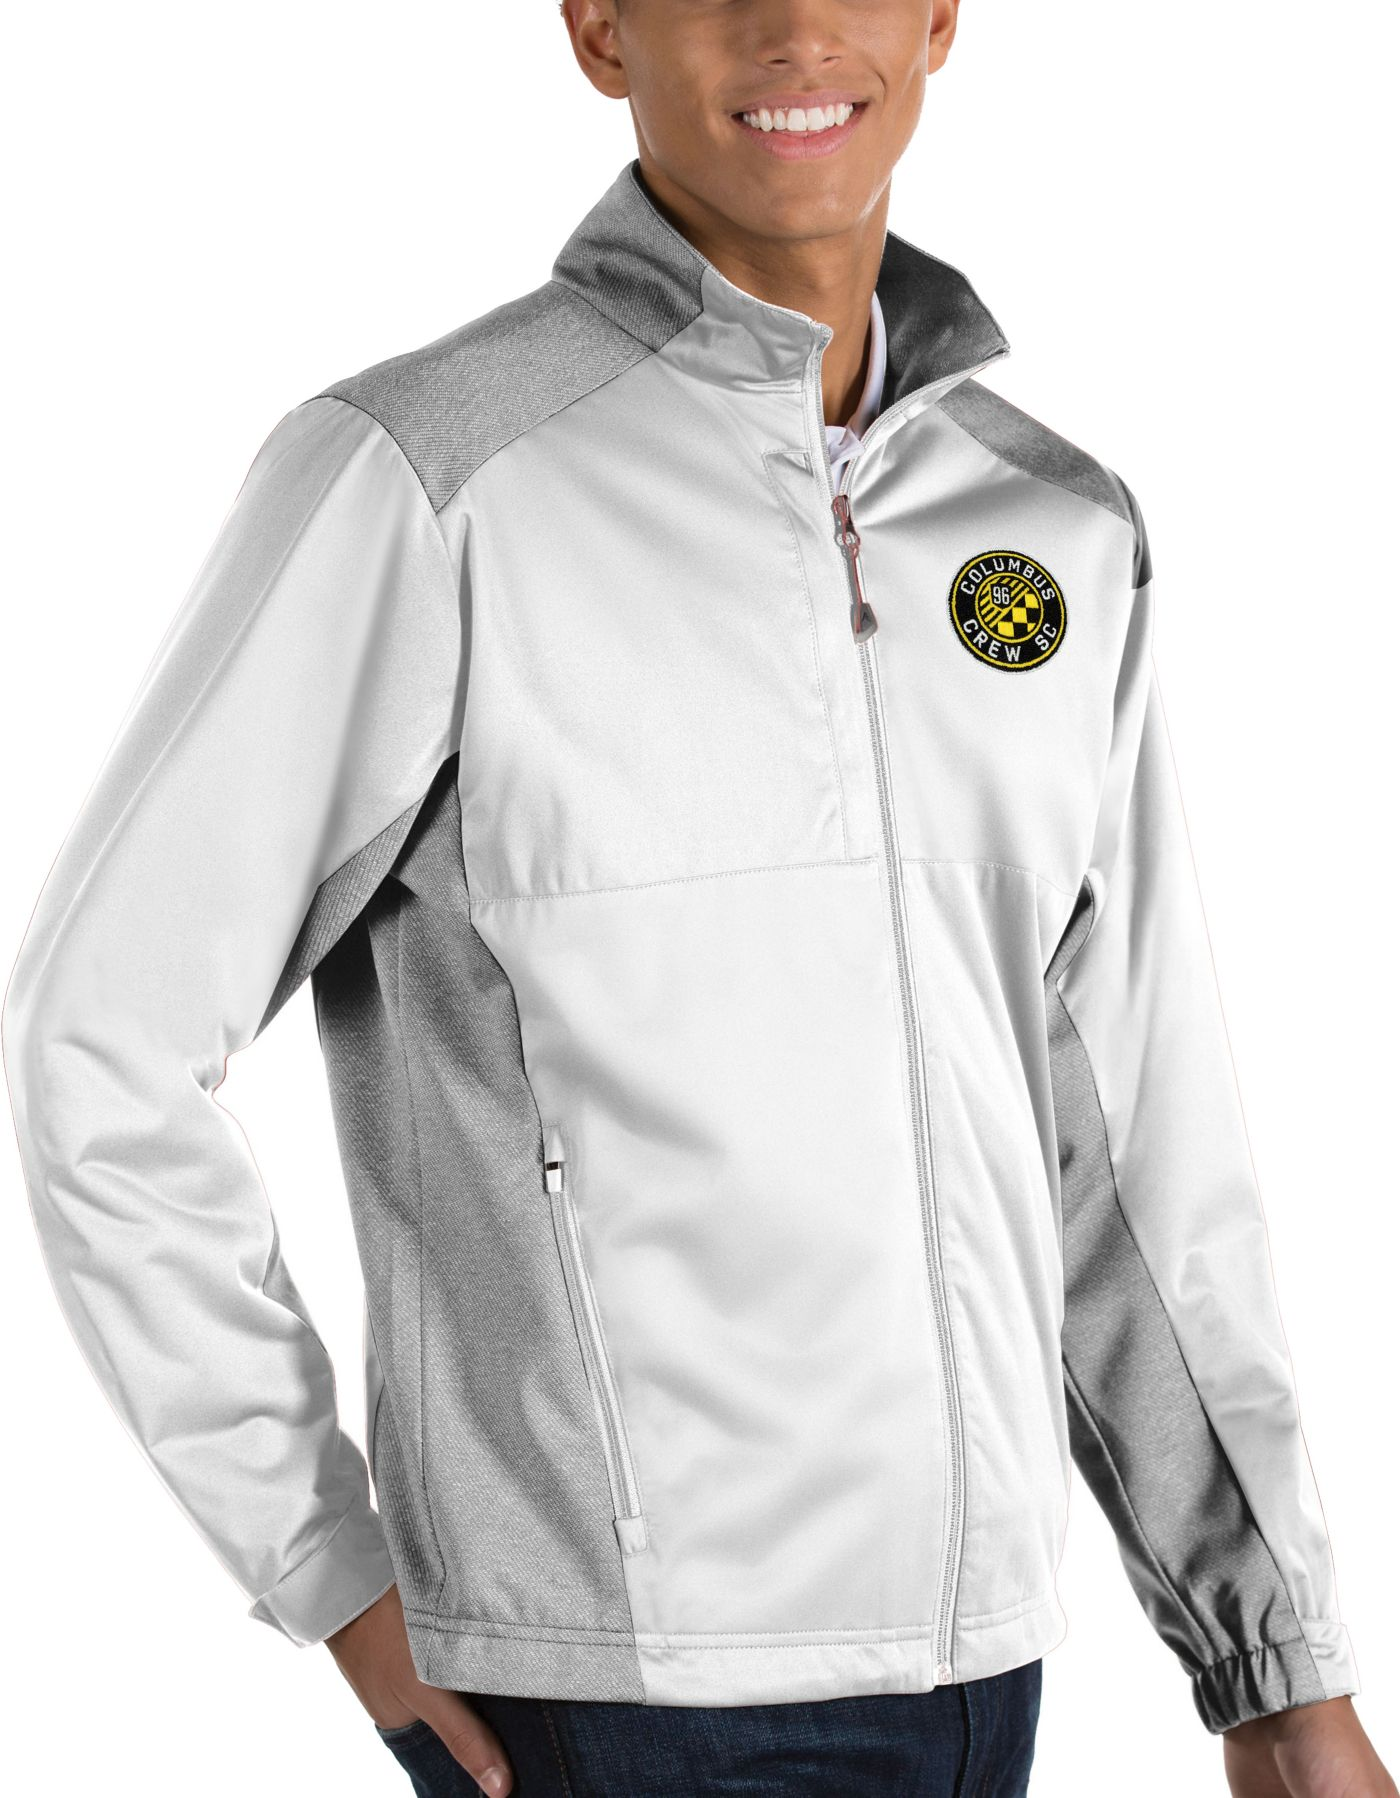 Antigua Men's Columbus Crew Revolve White Full-Zip Jacket